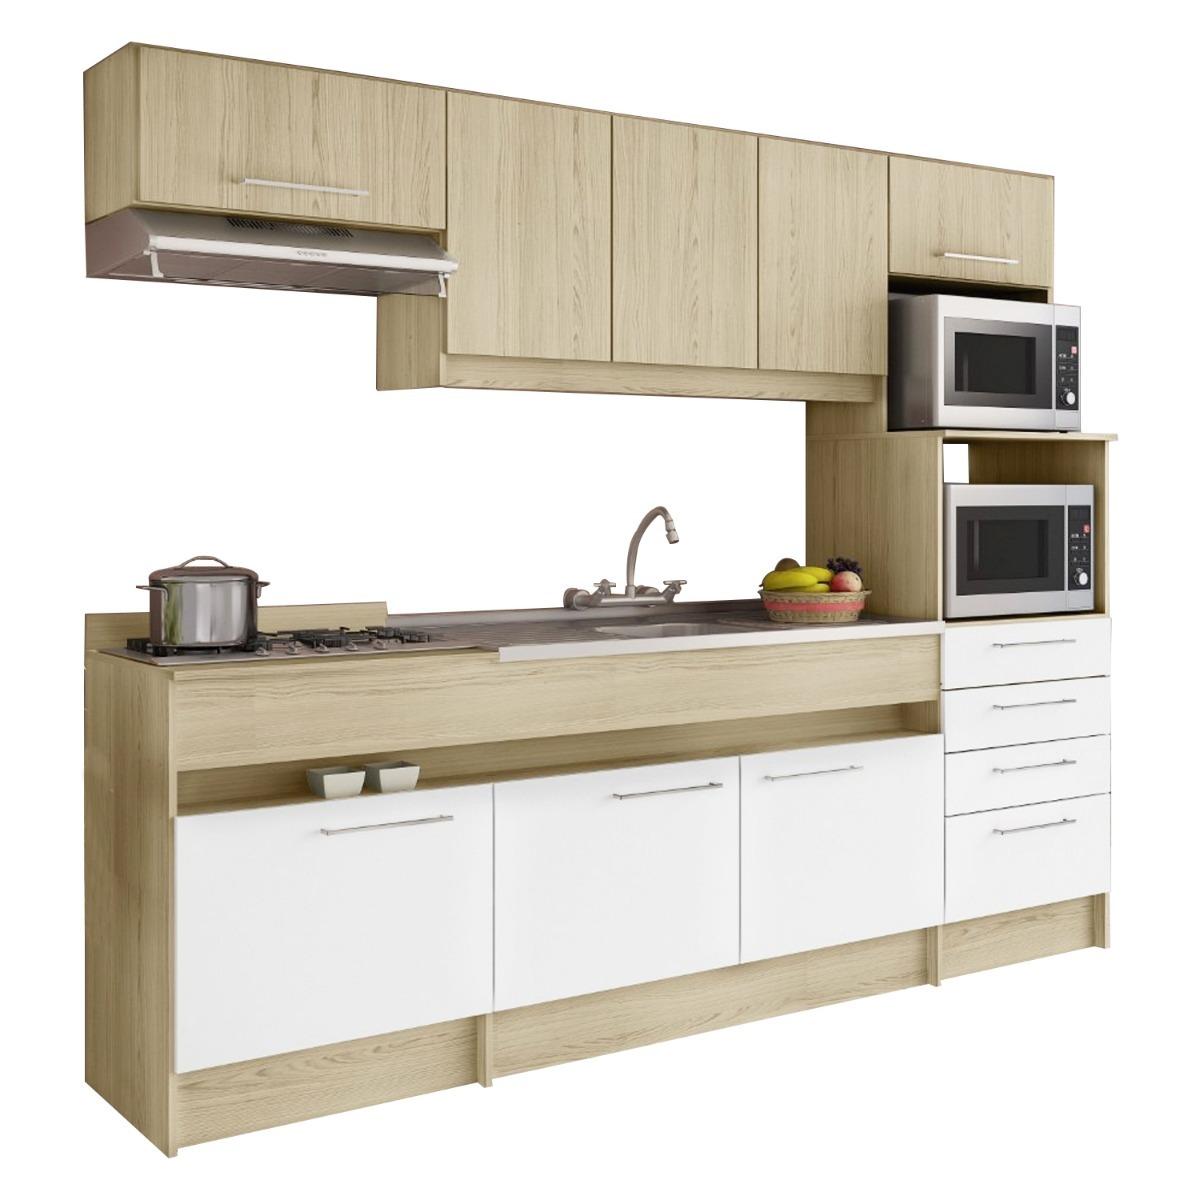 Kit Cocina Mueble 8 Puertas 4 Cajón Bali 137712 / Fernapet